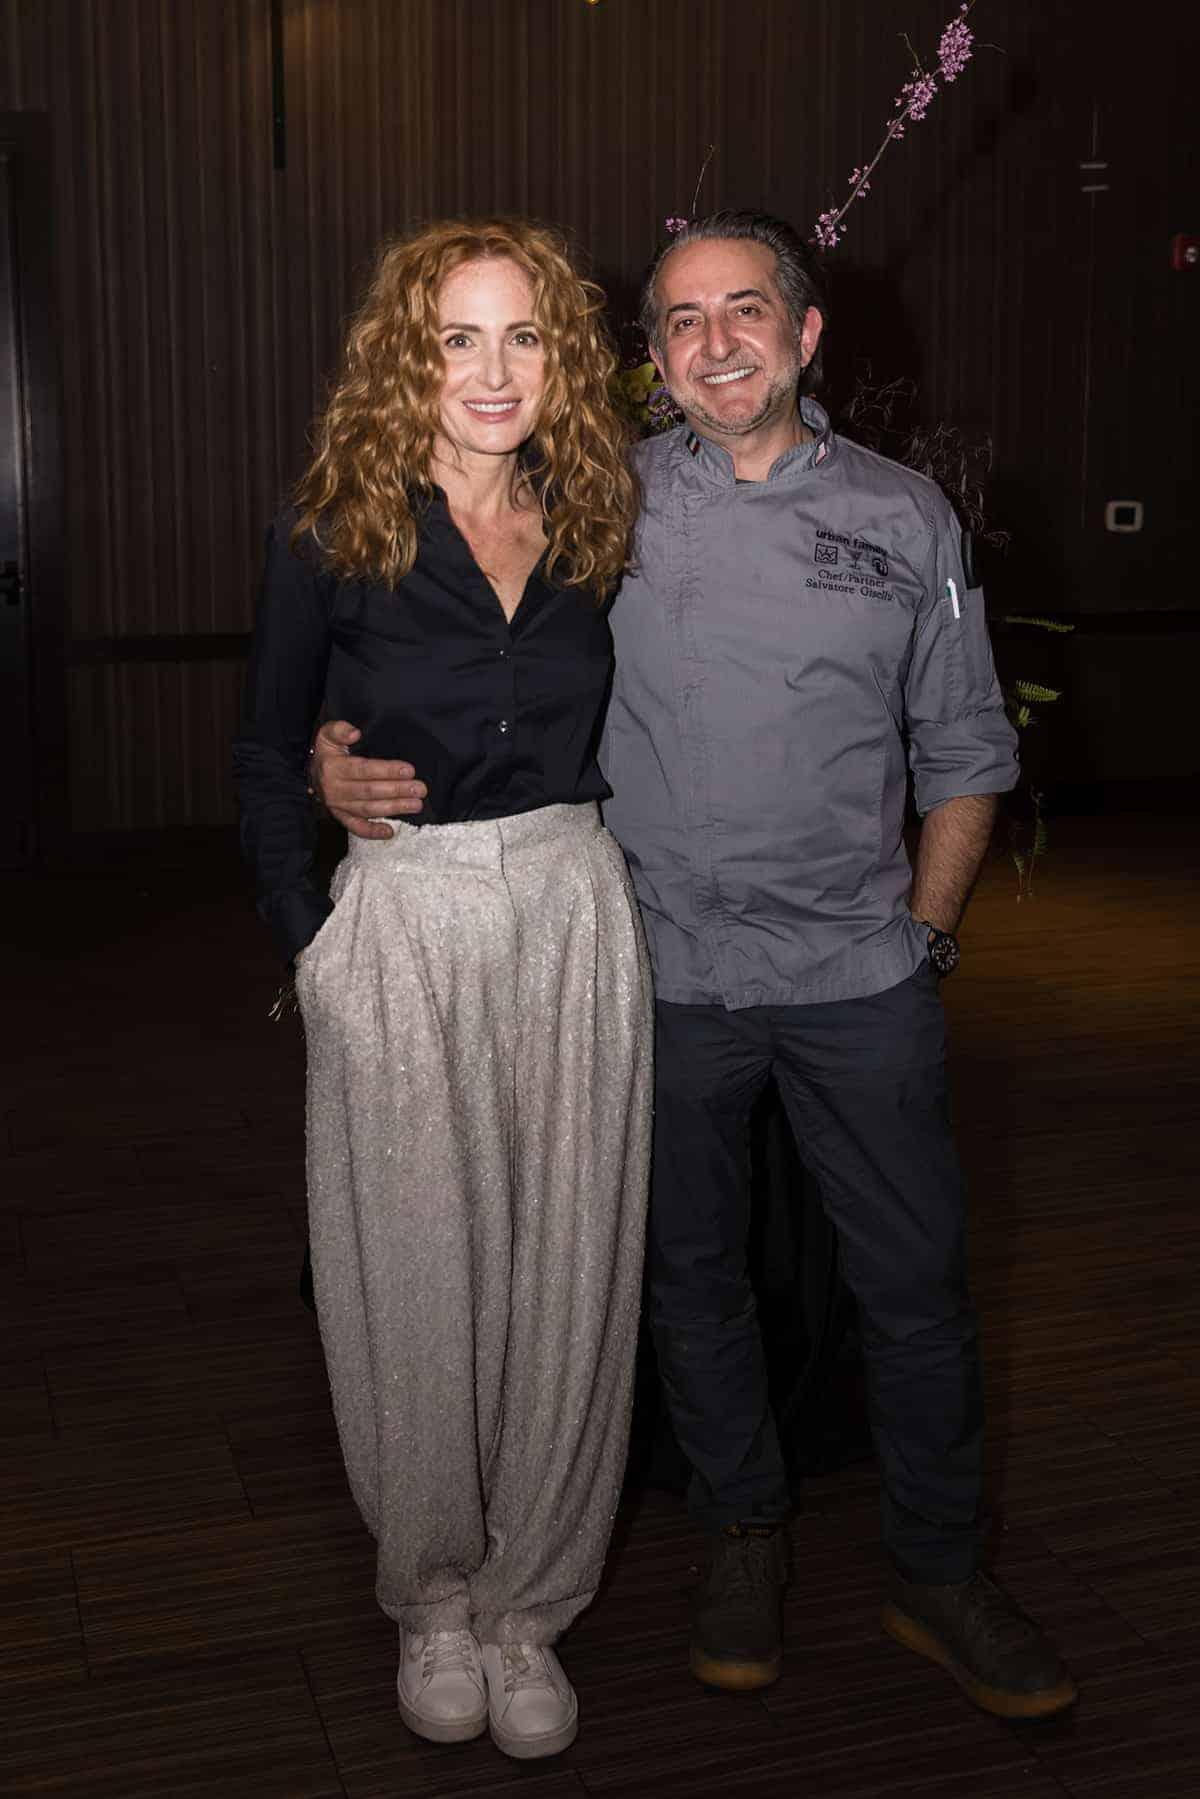 Jeanne-Marie and Chef Salvatore Gisellu